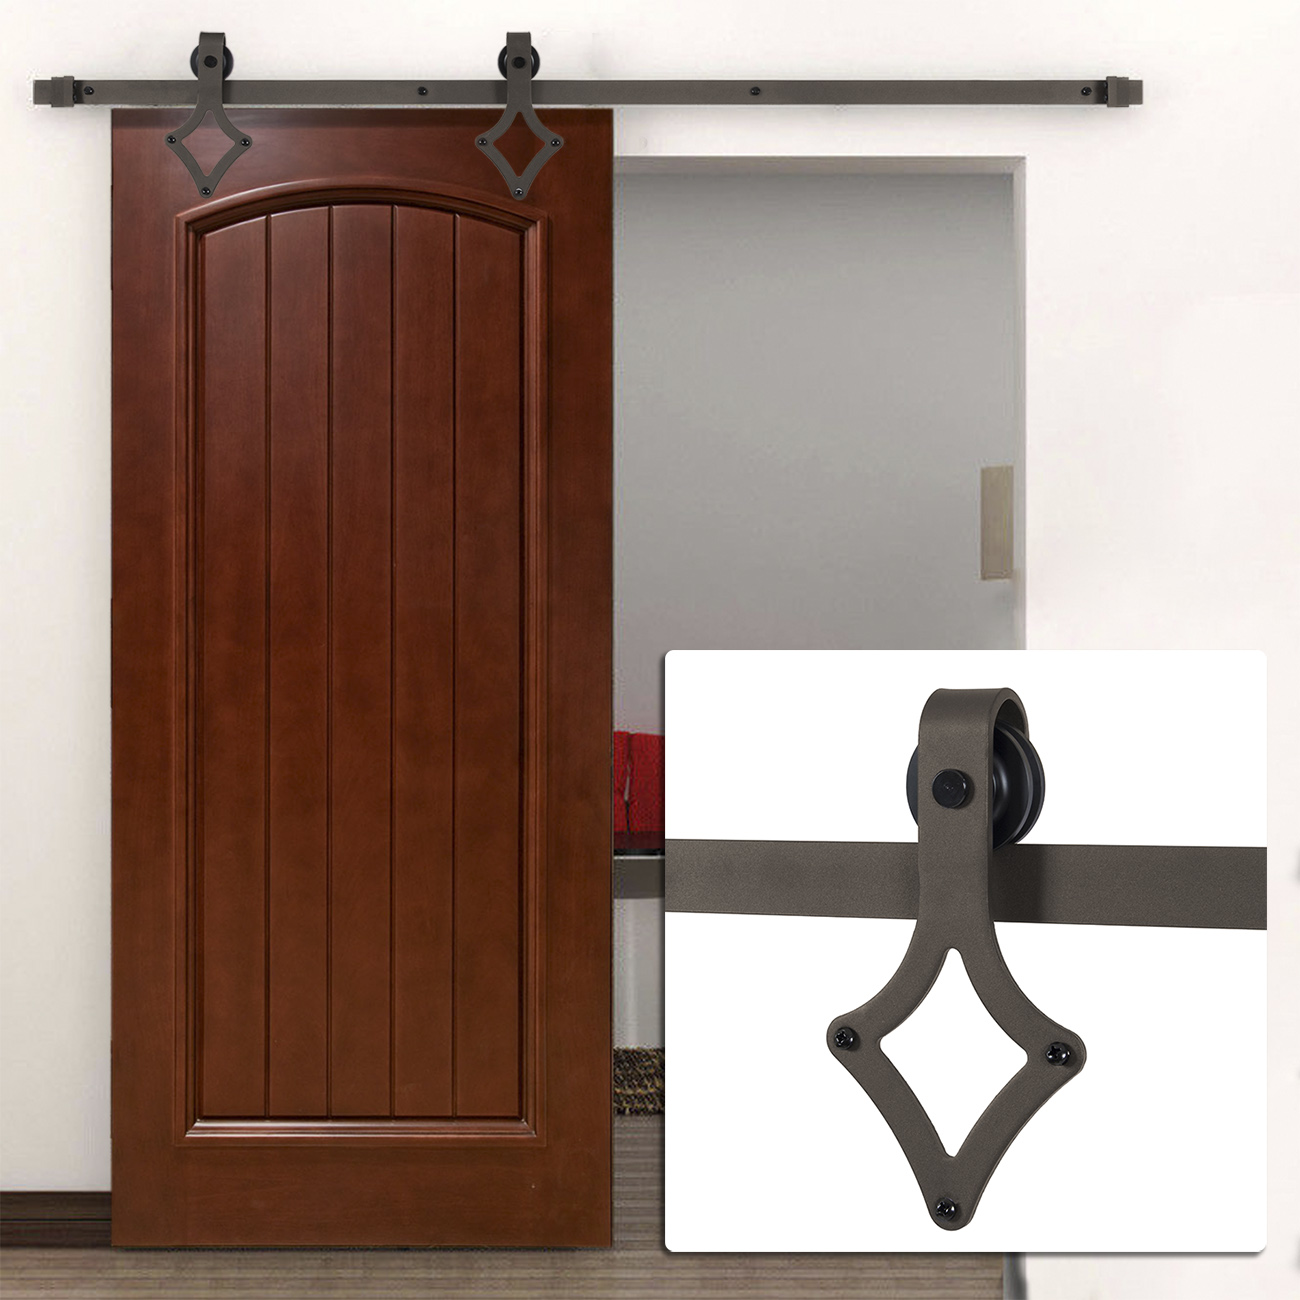 carbon steel interior sliding barn wood entry door ft double sliding barn door. Black Bedroom Furniture Sets. Home Design Ideas